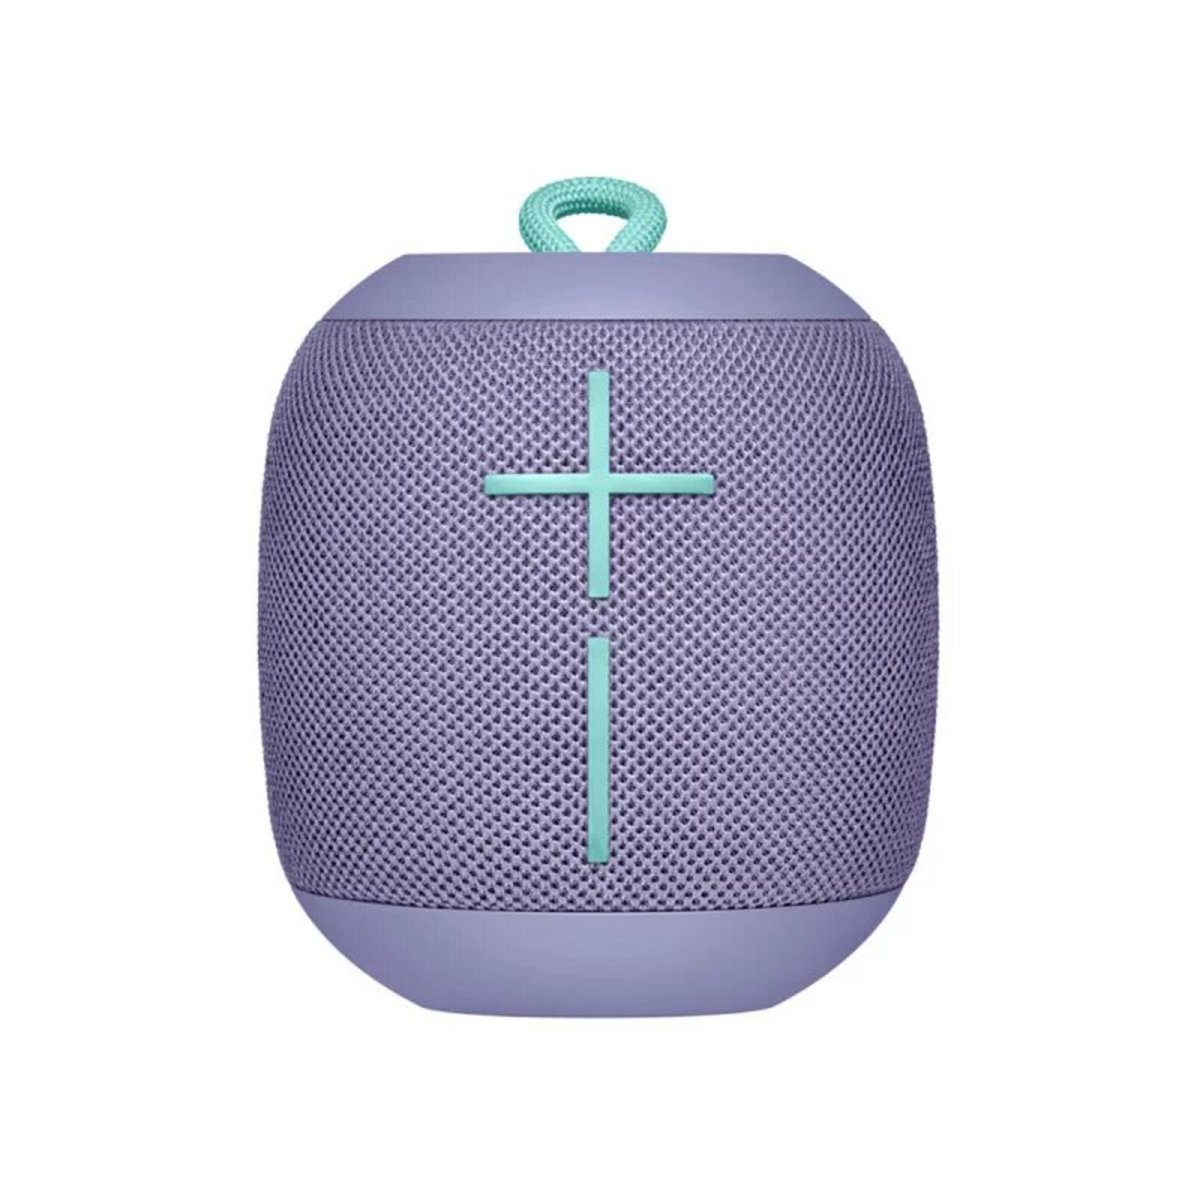 WONDERBOOM 防水無線藍芽喇叭 - 紫